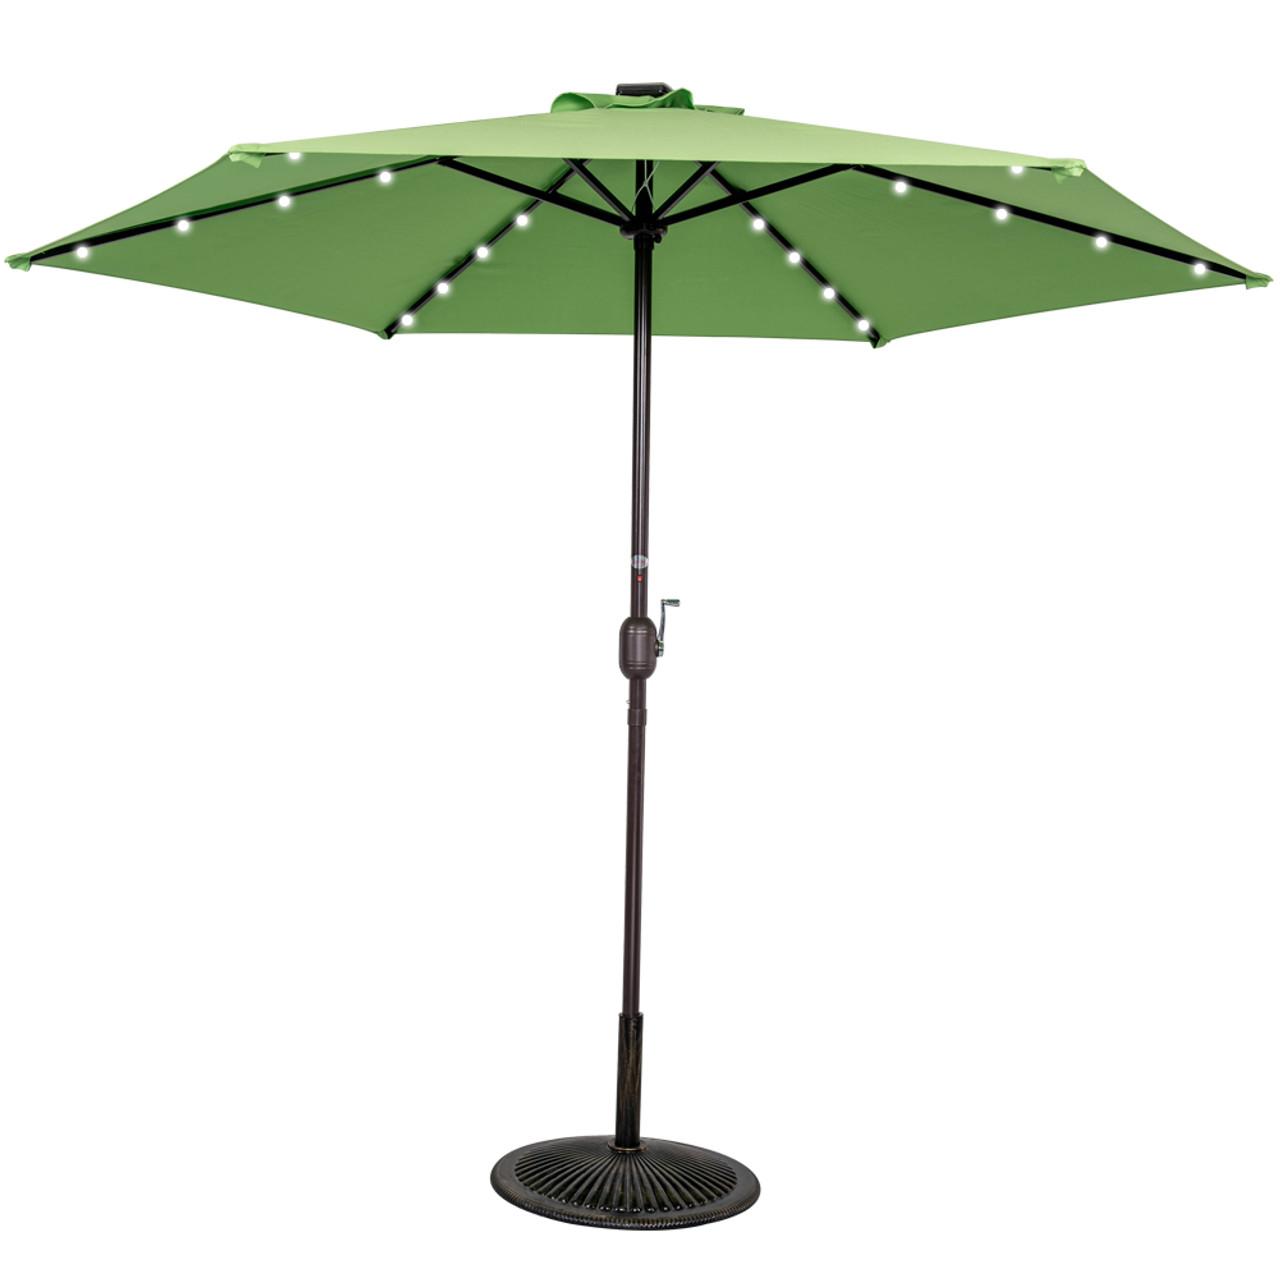 9ft 24 Led Light Outdoor Market Patio Umbrella Garden Pool With Crank, 6  Ribs (Lime Green)